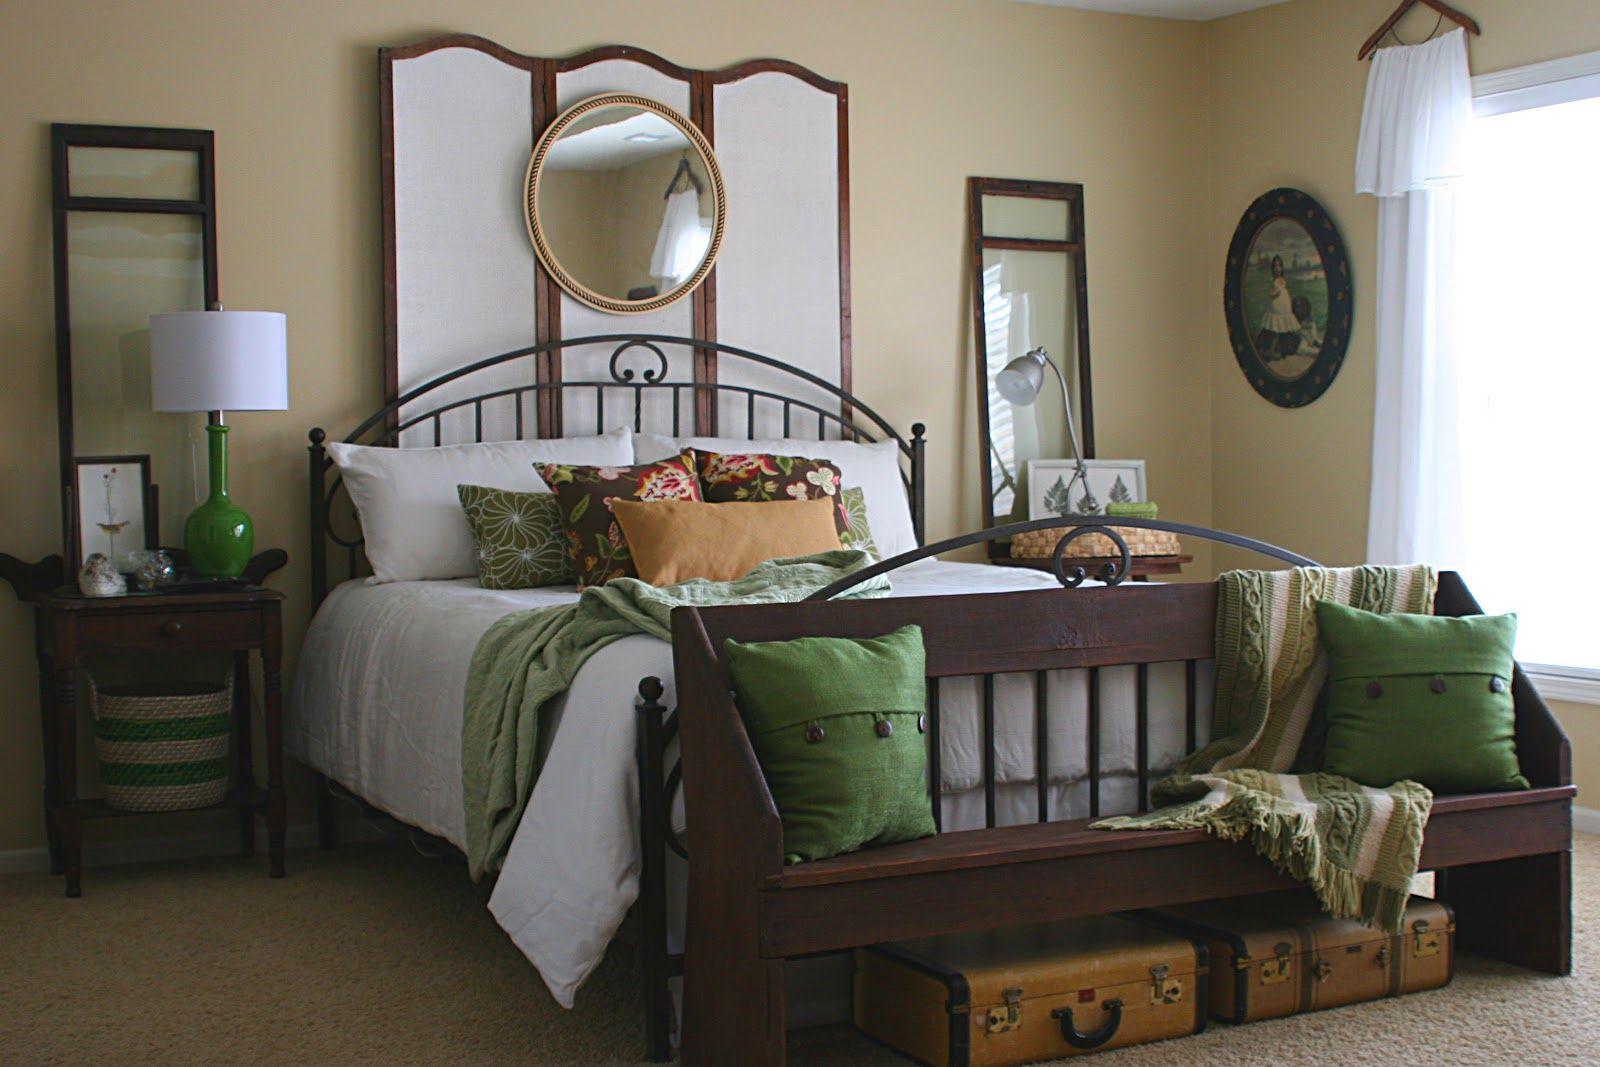 Mamie Jane's Master Bedroom Reveal Bedroom decor, Home